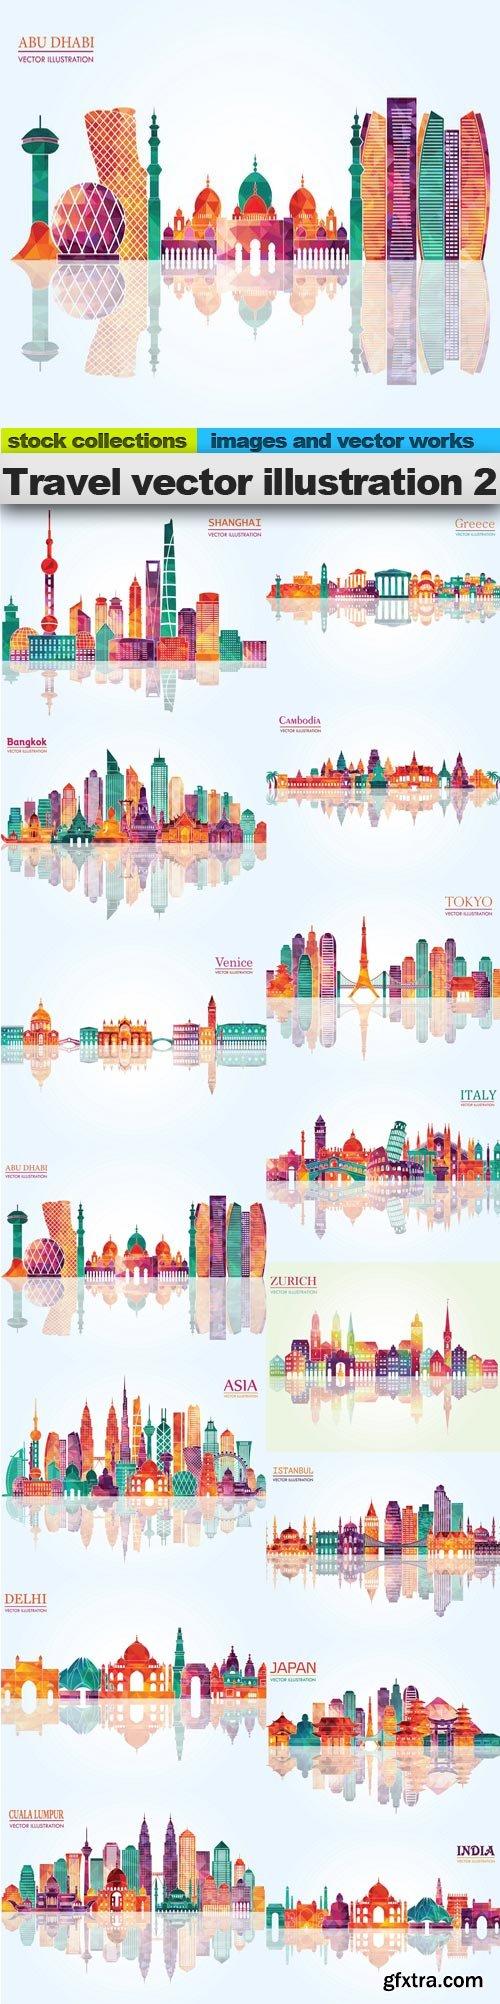 Travel vector illustration 2, 15 x EPS